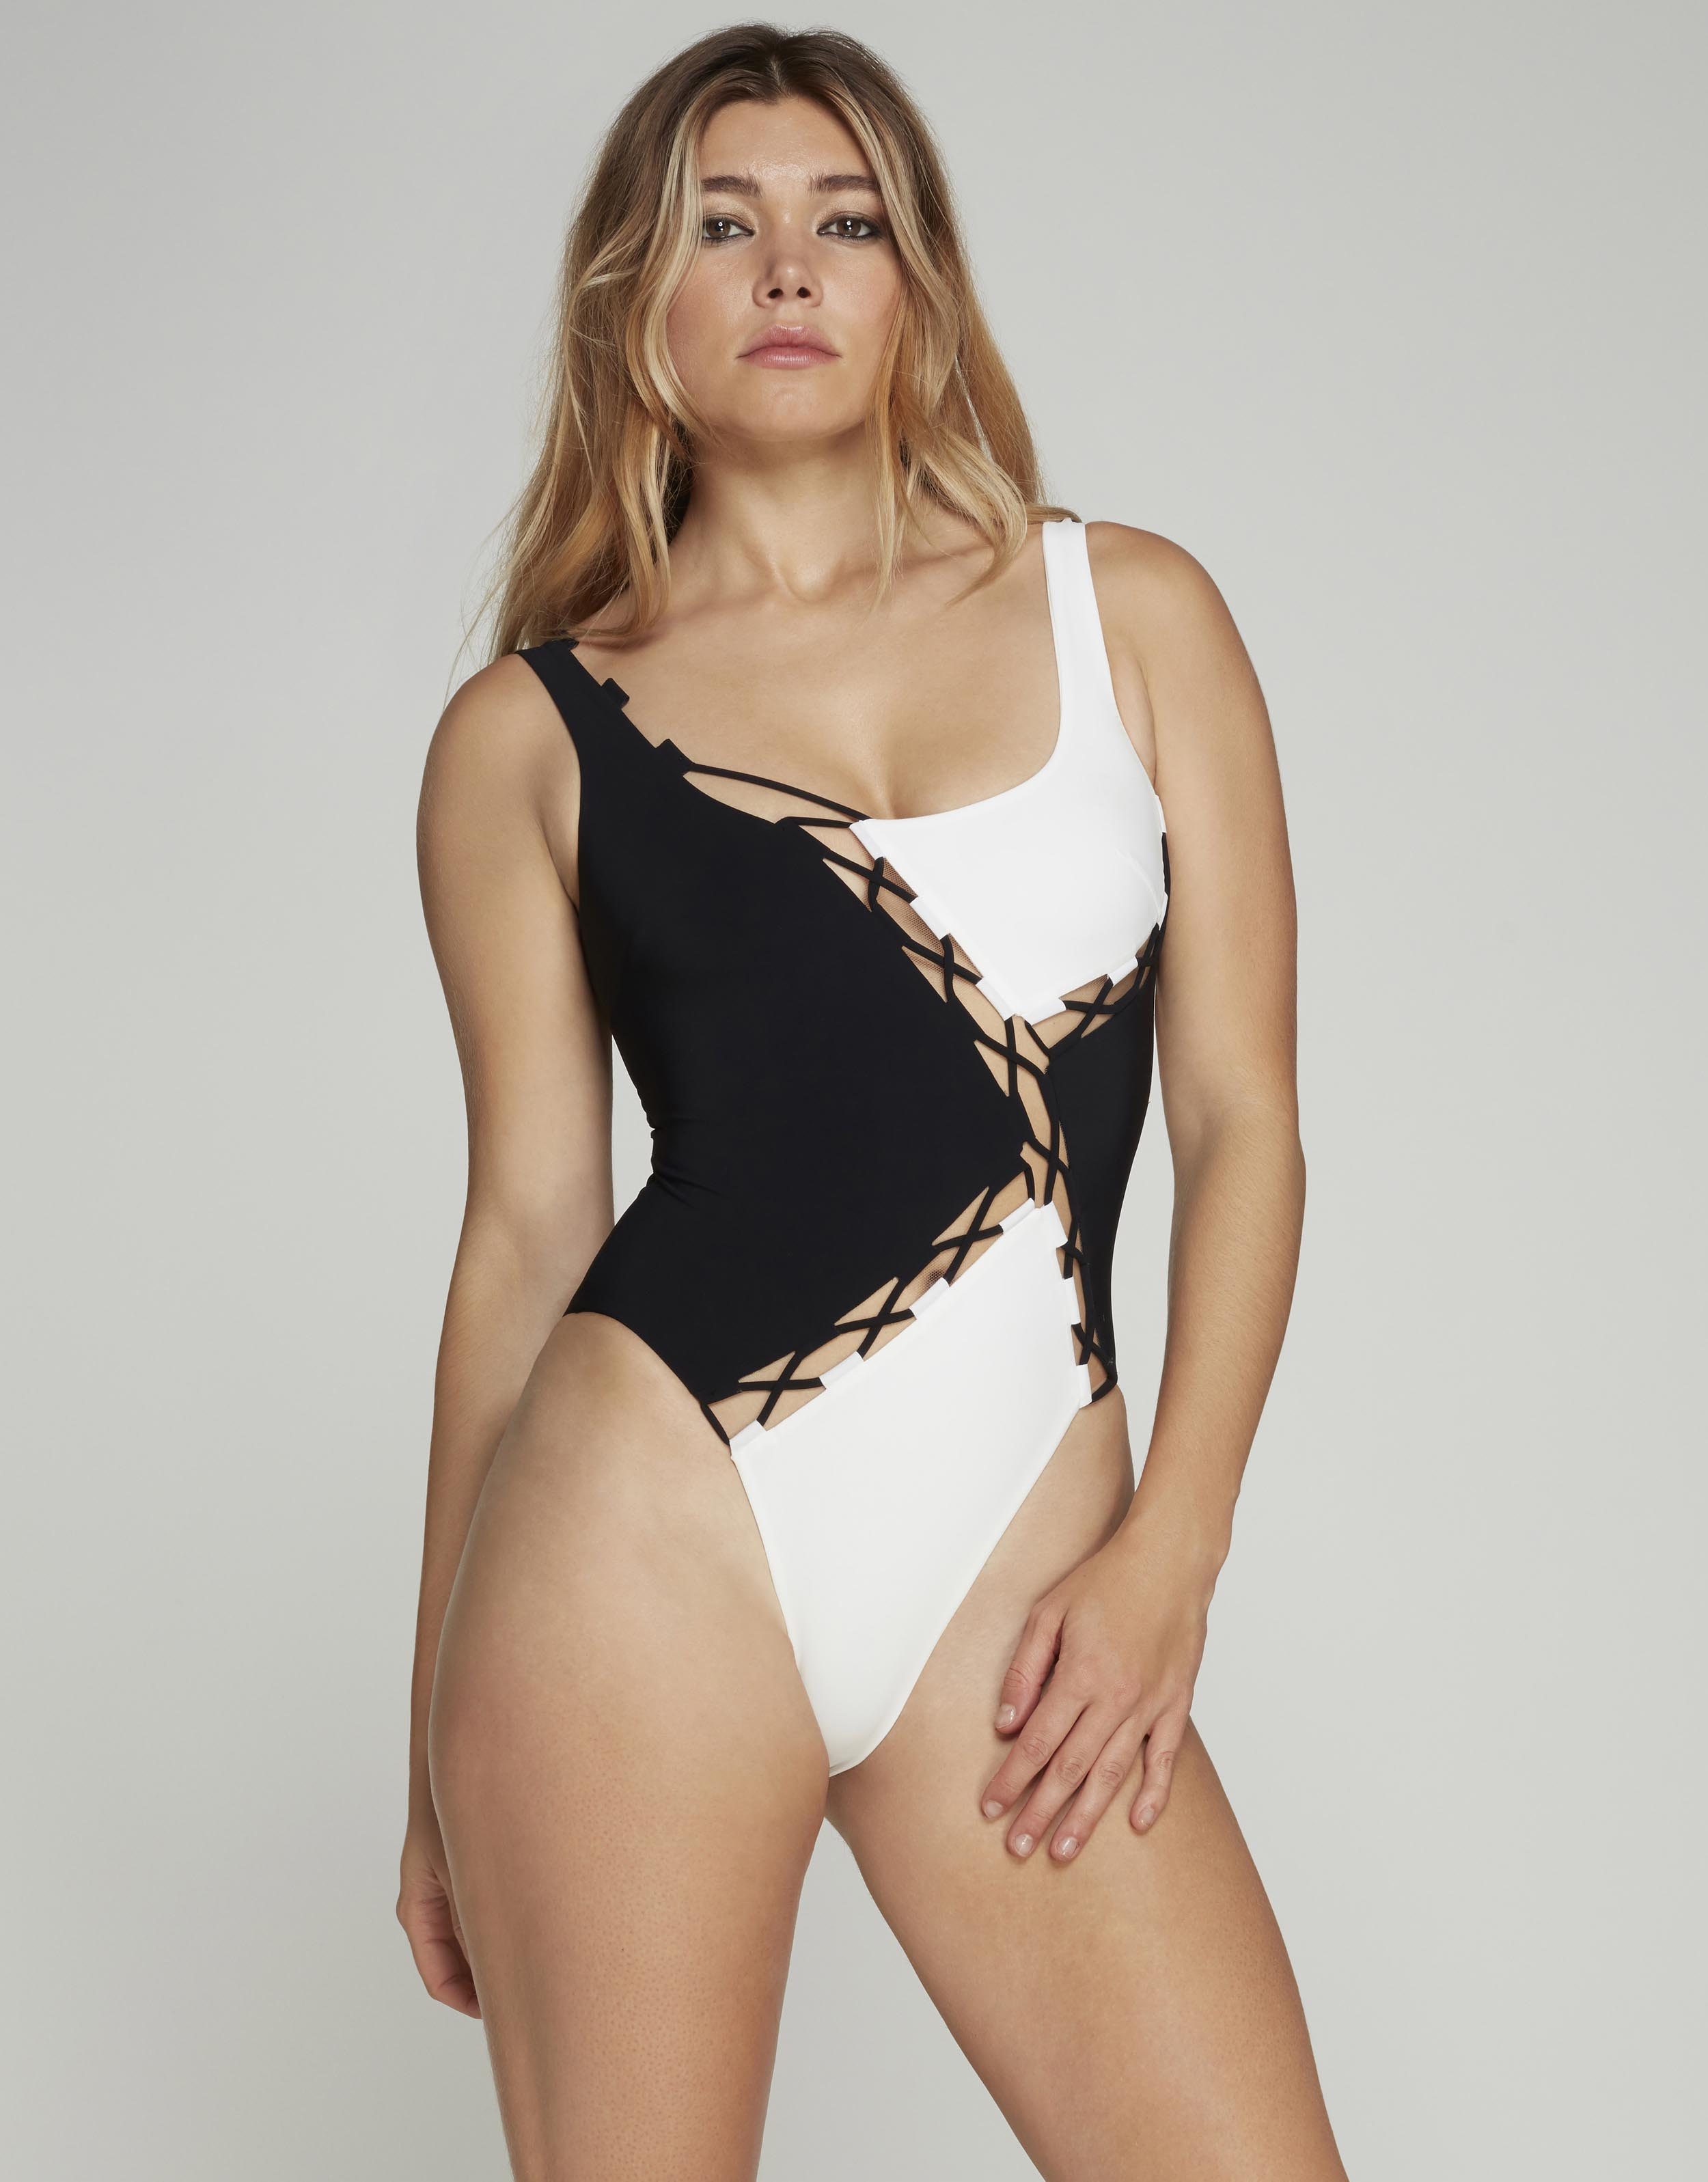 Agent Provocateur Jojo Monochrome Swimsuit In Black & White